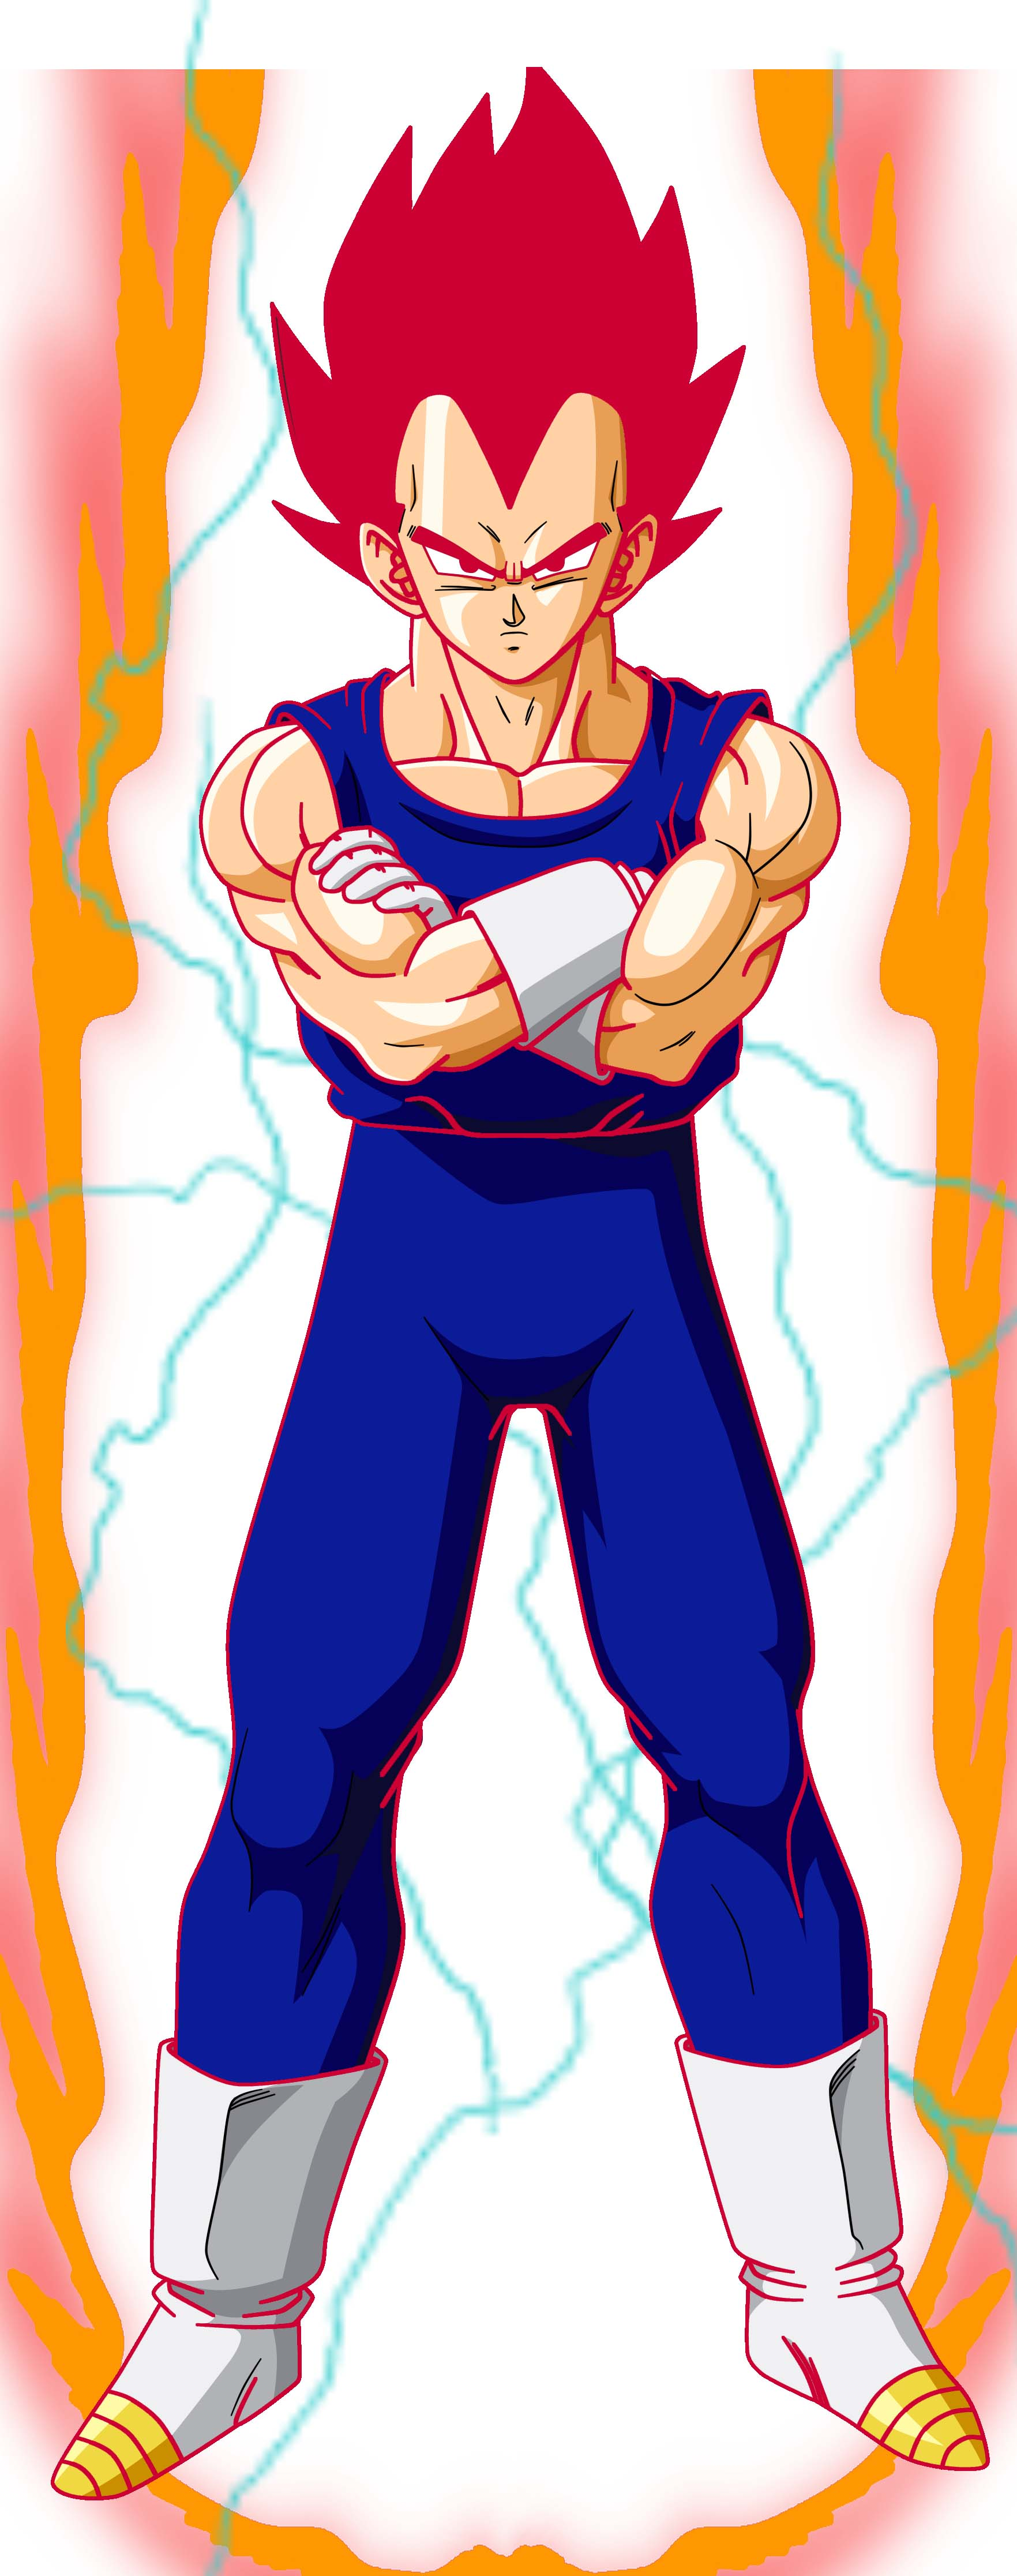 Super saiyan god 2 vegeta dragonball fanon wiki fandom - Vegeta super sayen 2 ...